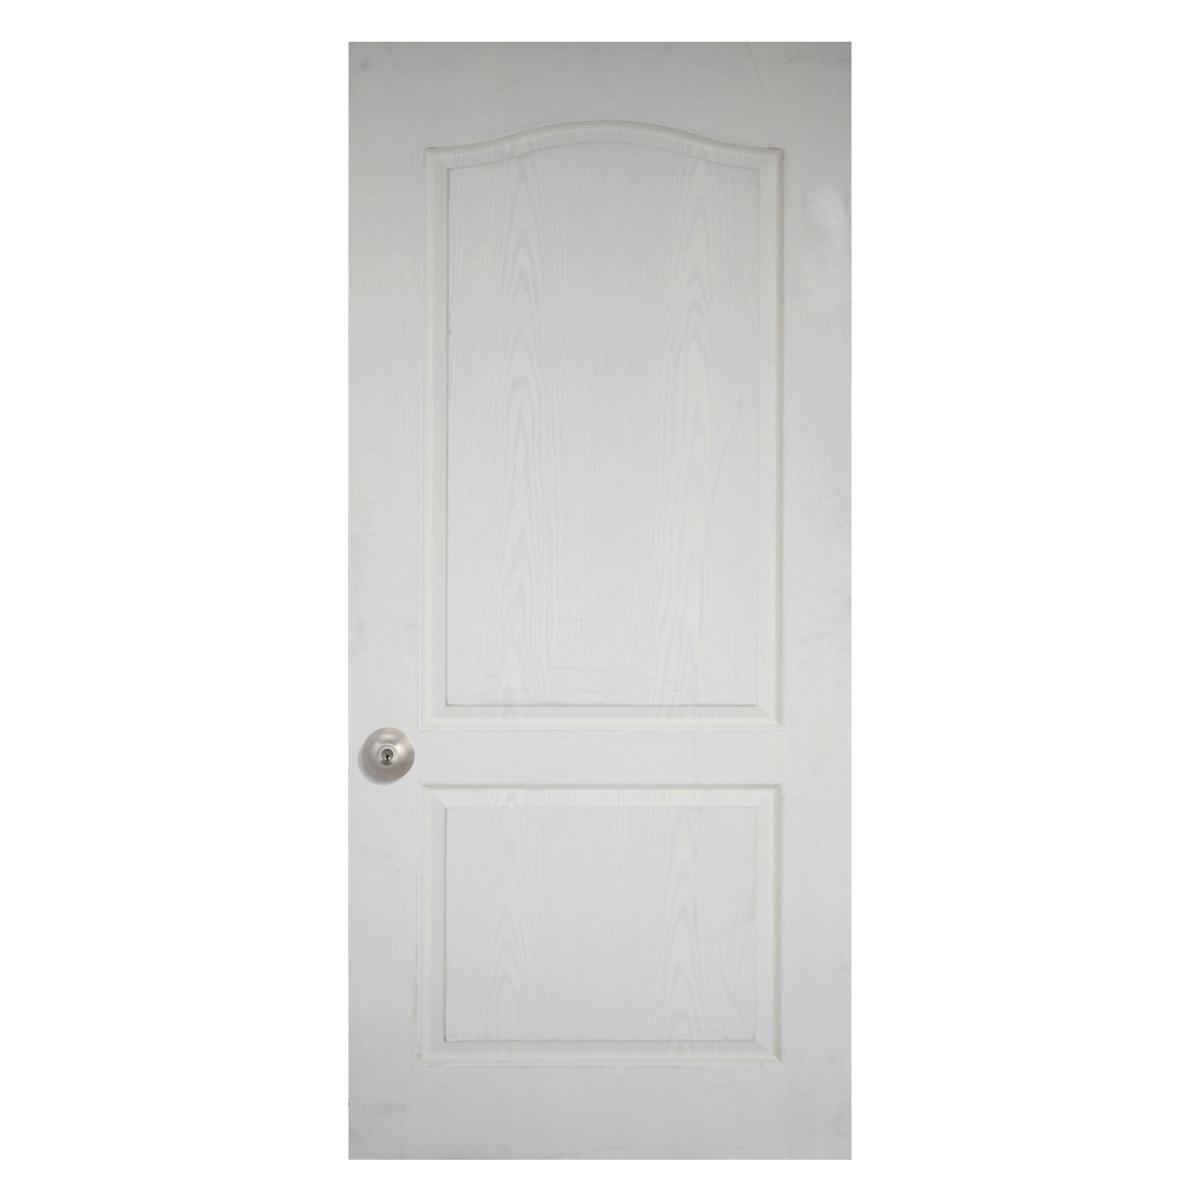 Leo Dore' : ประตูลูกฟัก 2 โค้ง ผิวลายไม้ สีรองพื้นขาว